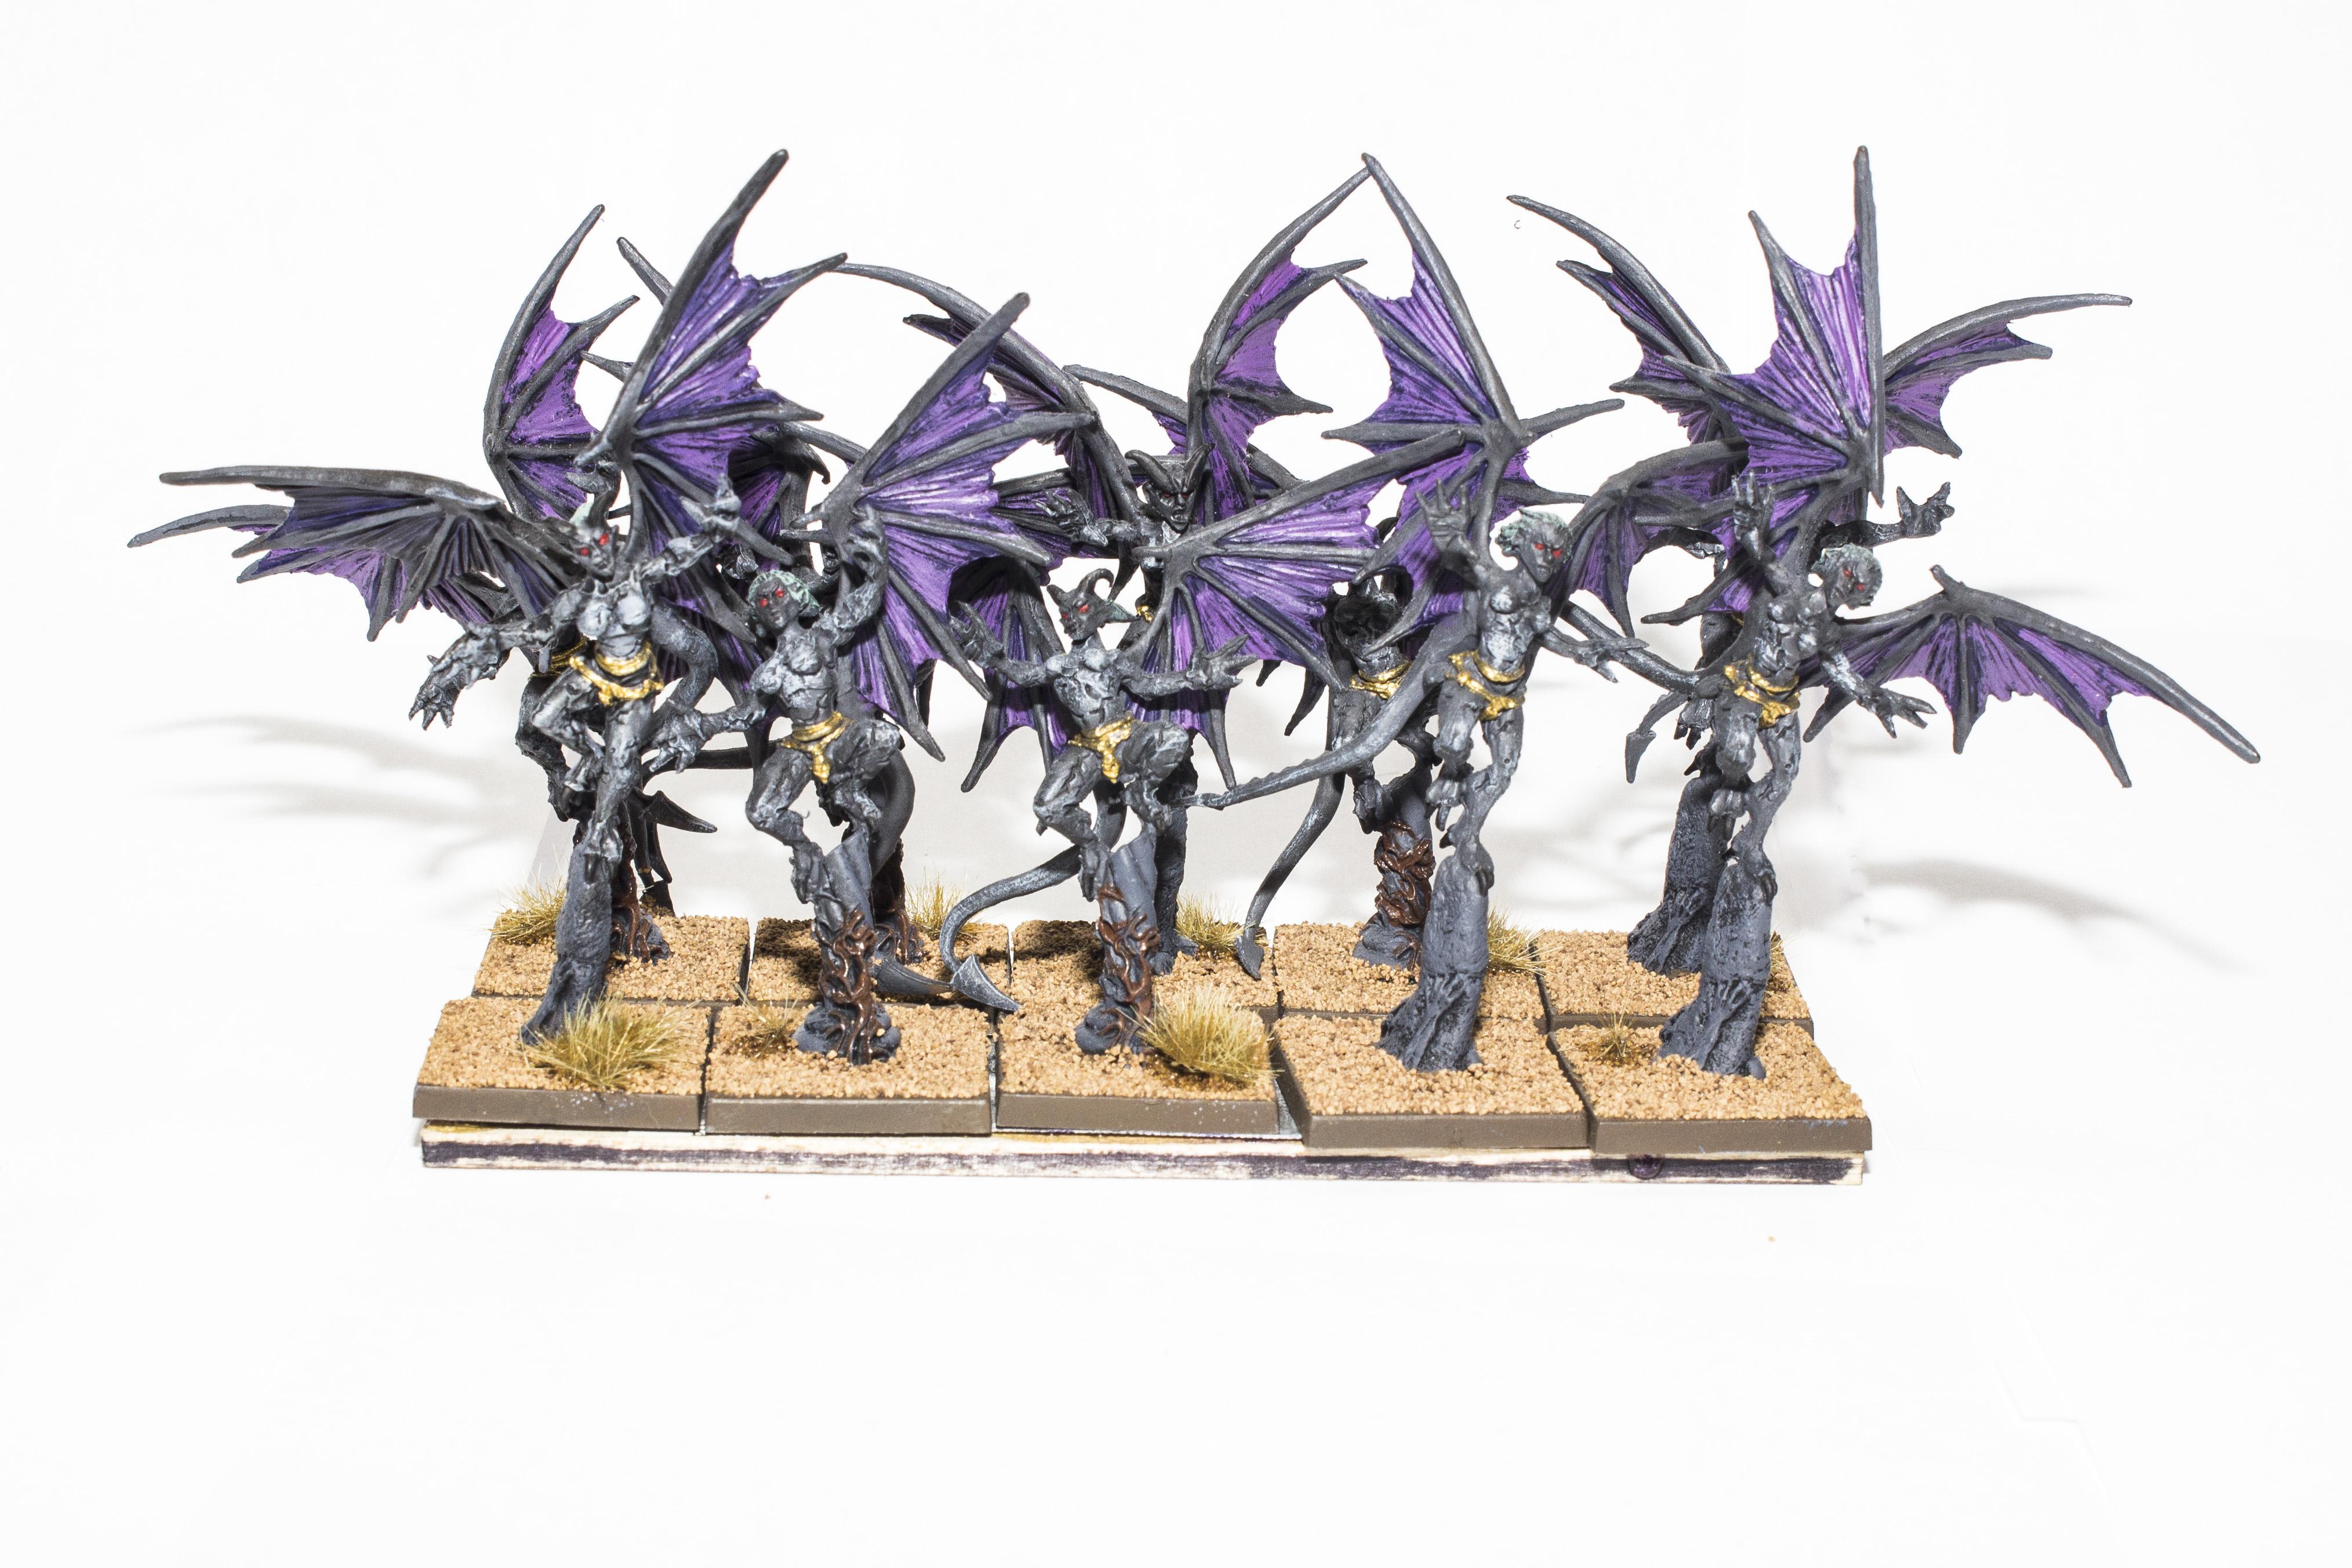 Abyssal_Dwarves_Gargoyles_1